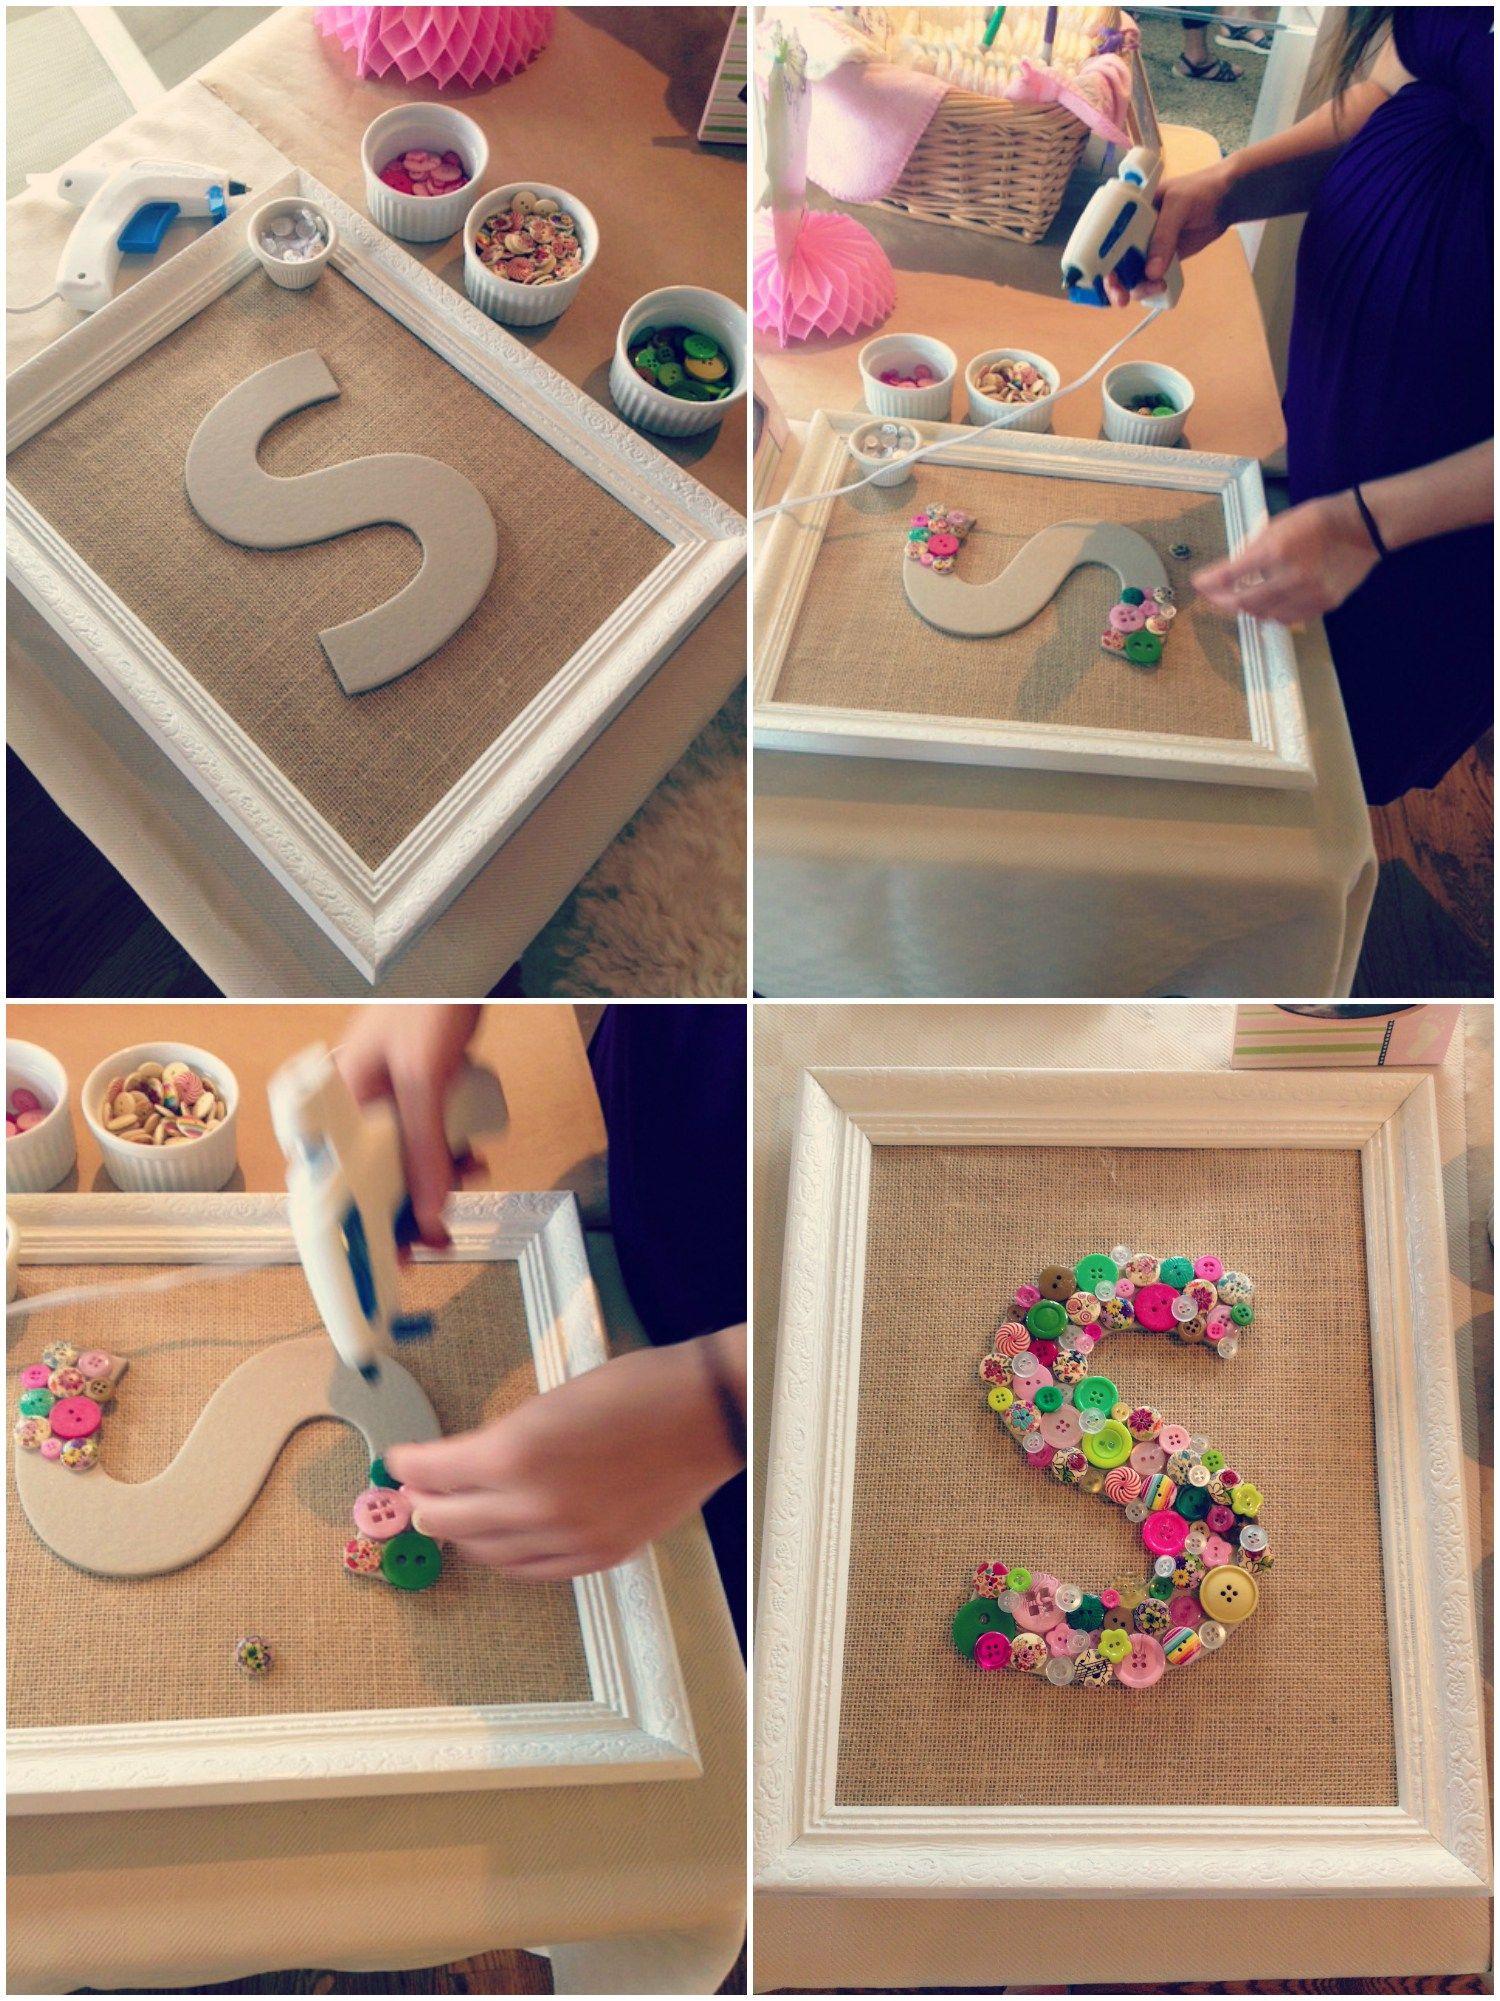 Diy Baby Shower Button Monogram Craft Collage 4 Crafting Diy